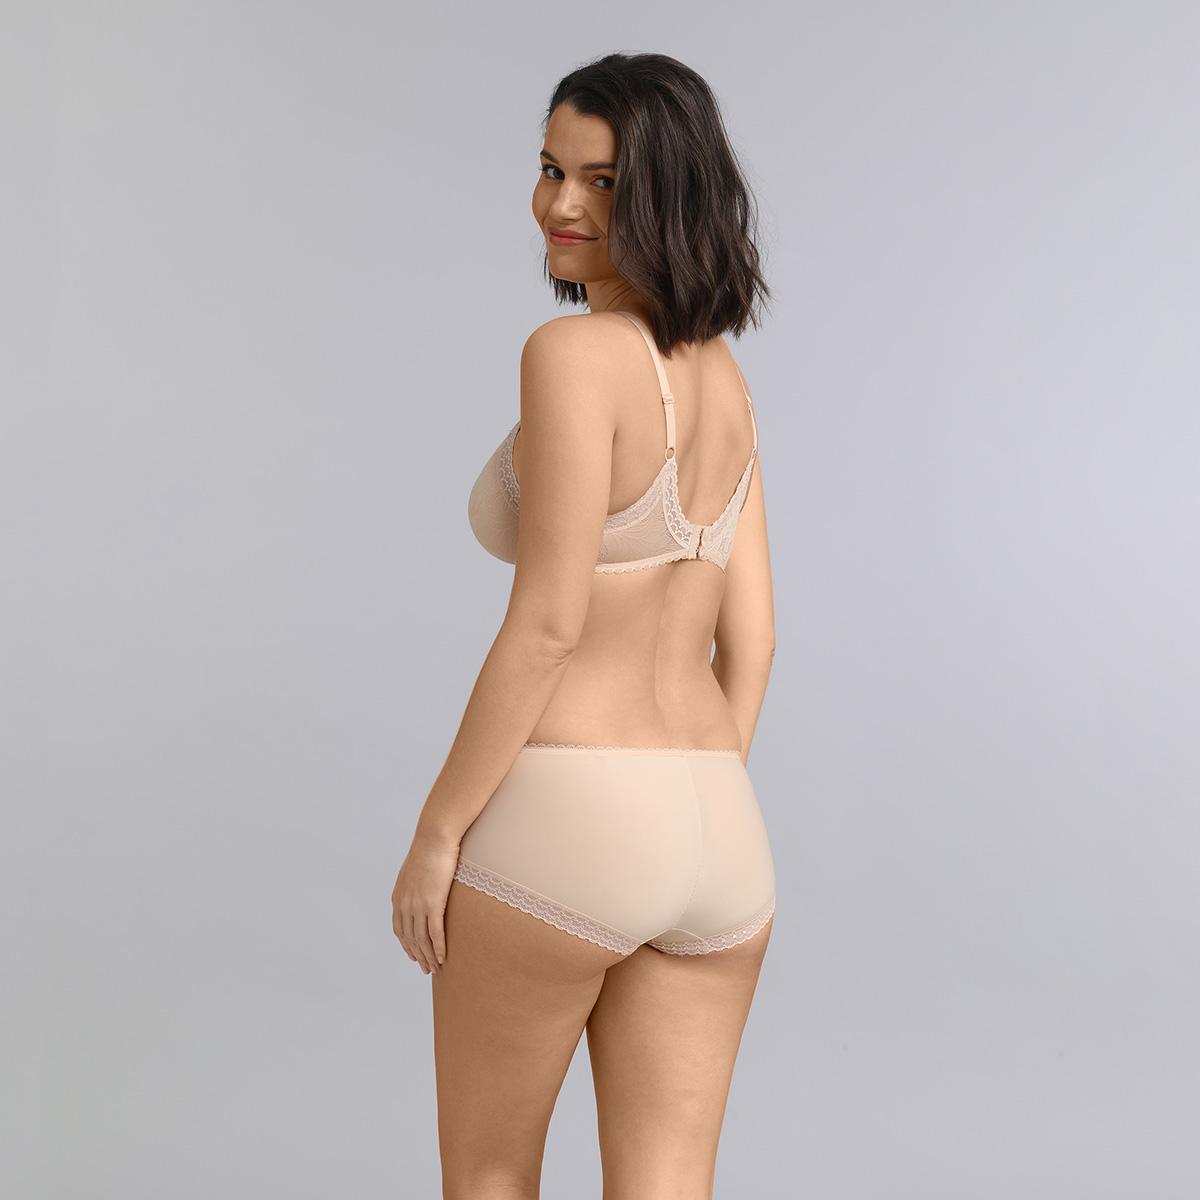 Underwired triangle bra in beige Invisible Elegance, , PLAYTEX